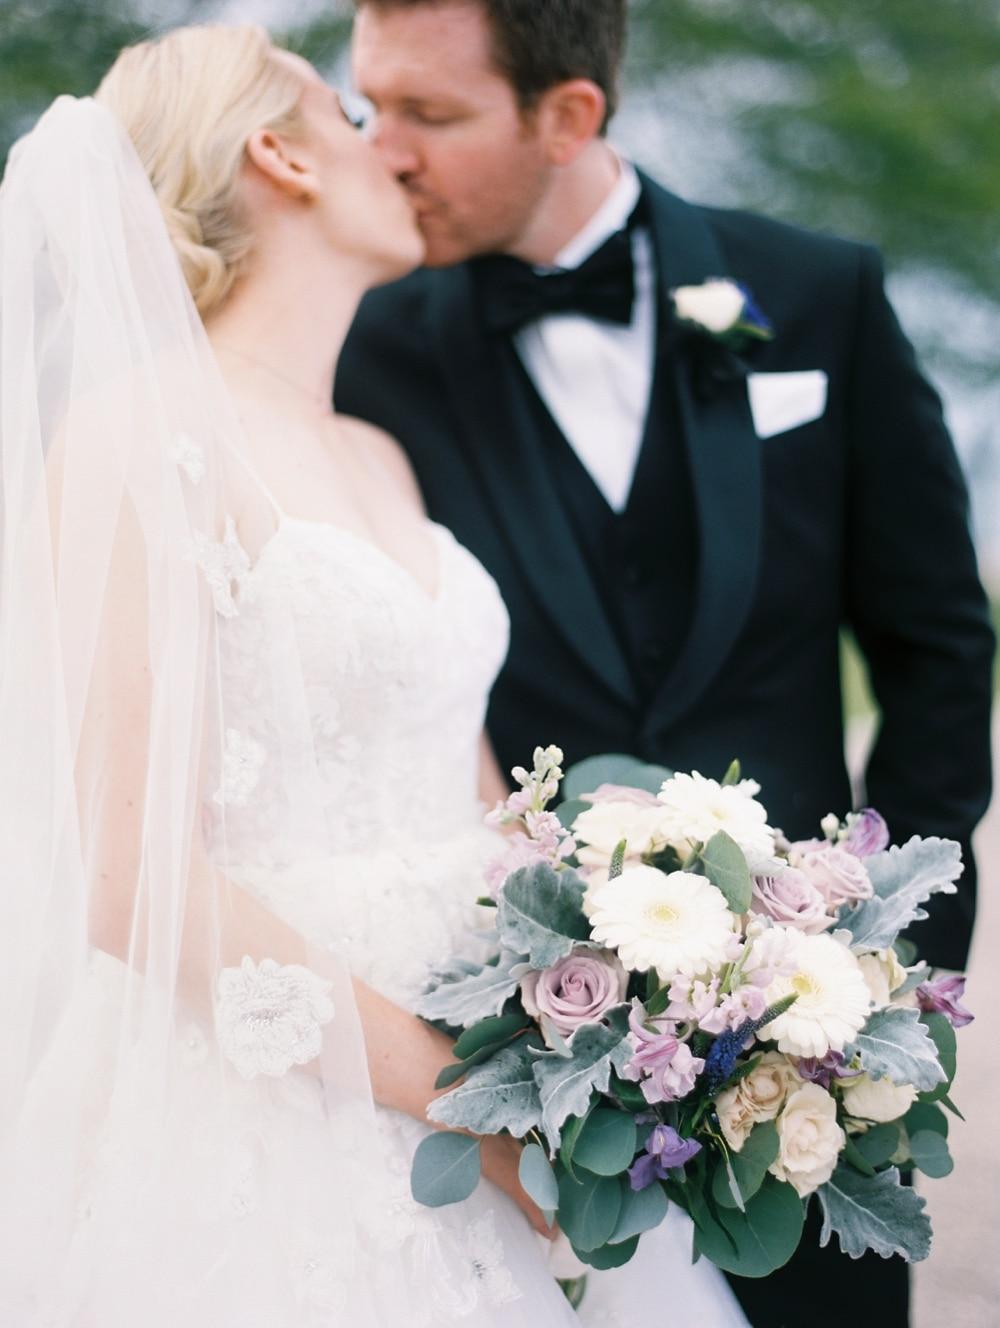 Kristin-La-Voie-Photography-salvatore's-chicago-wedding-photographer-22